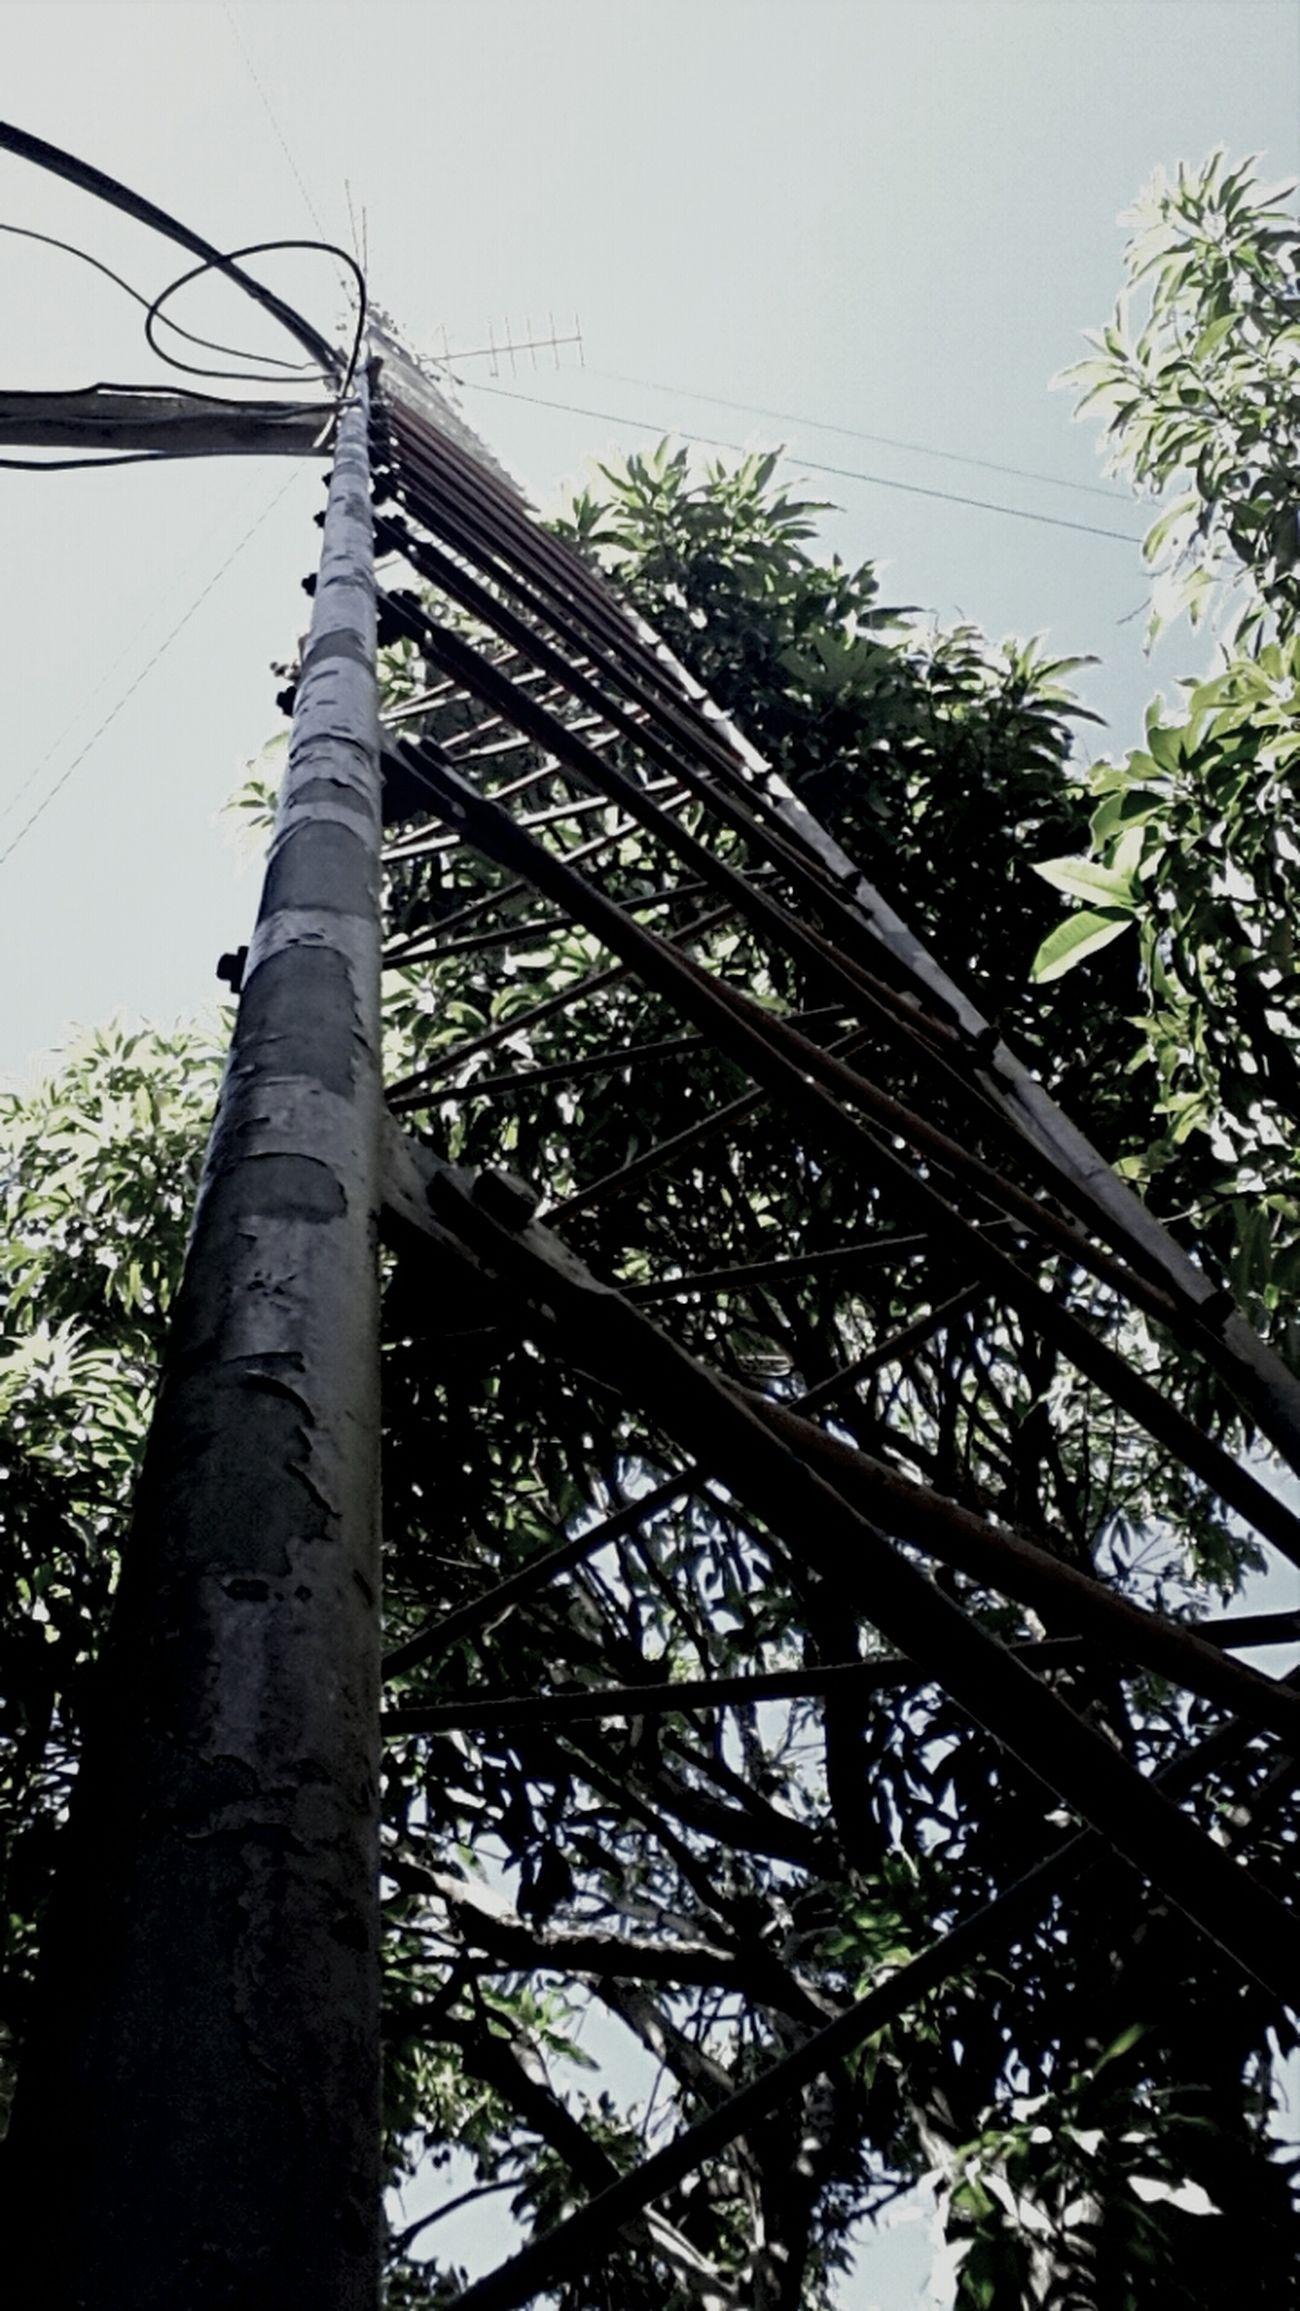 ManaguaSky RadioAntena TheLifeOfAntena